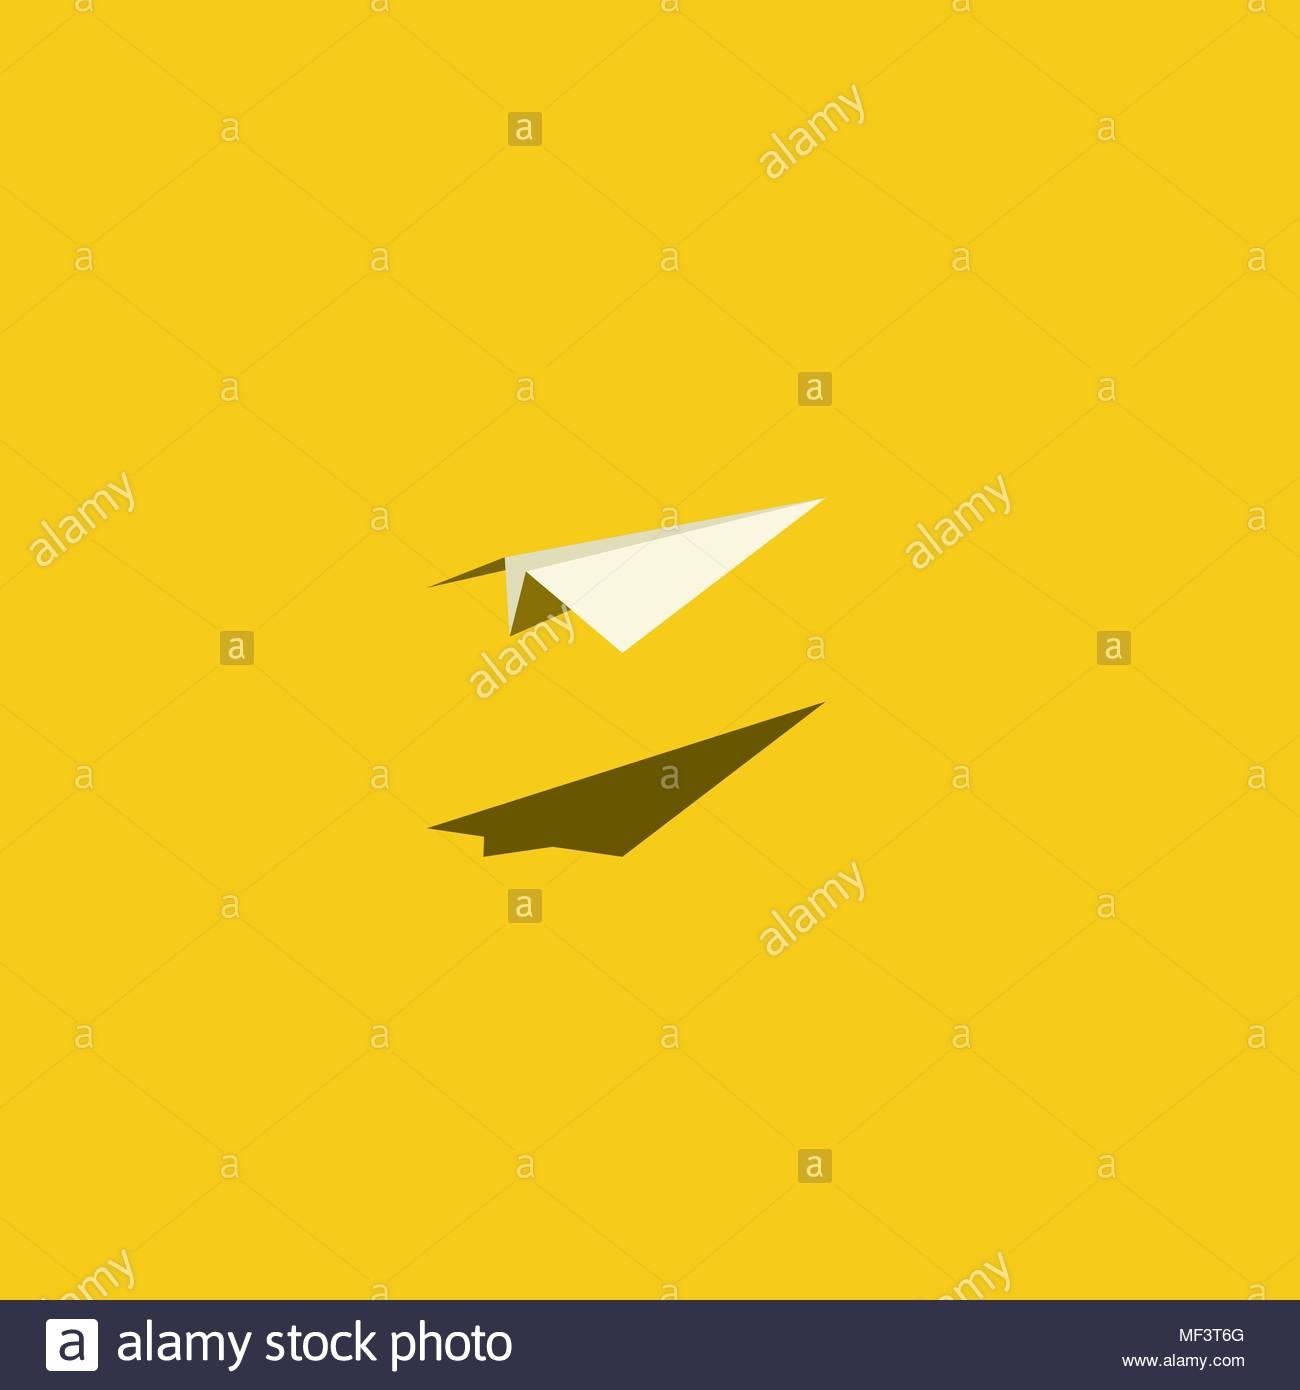 Paper Plane Vector Illustration On Bright Yellow Background Symbol